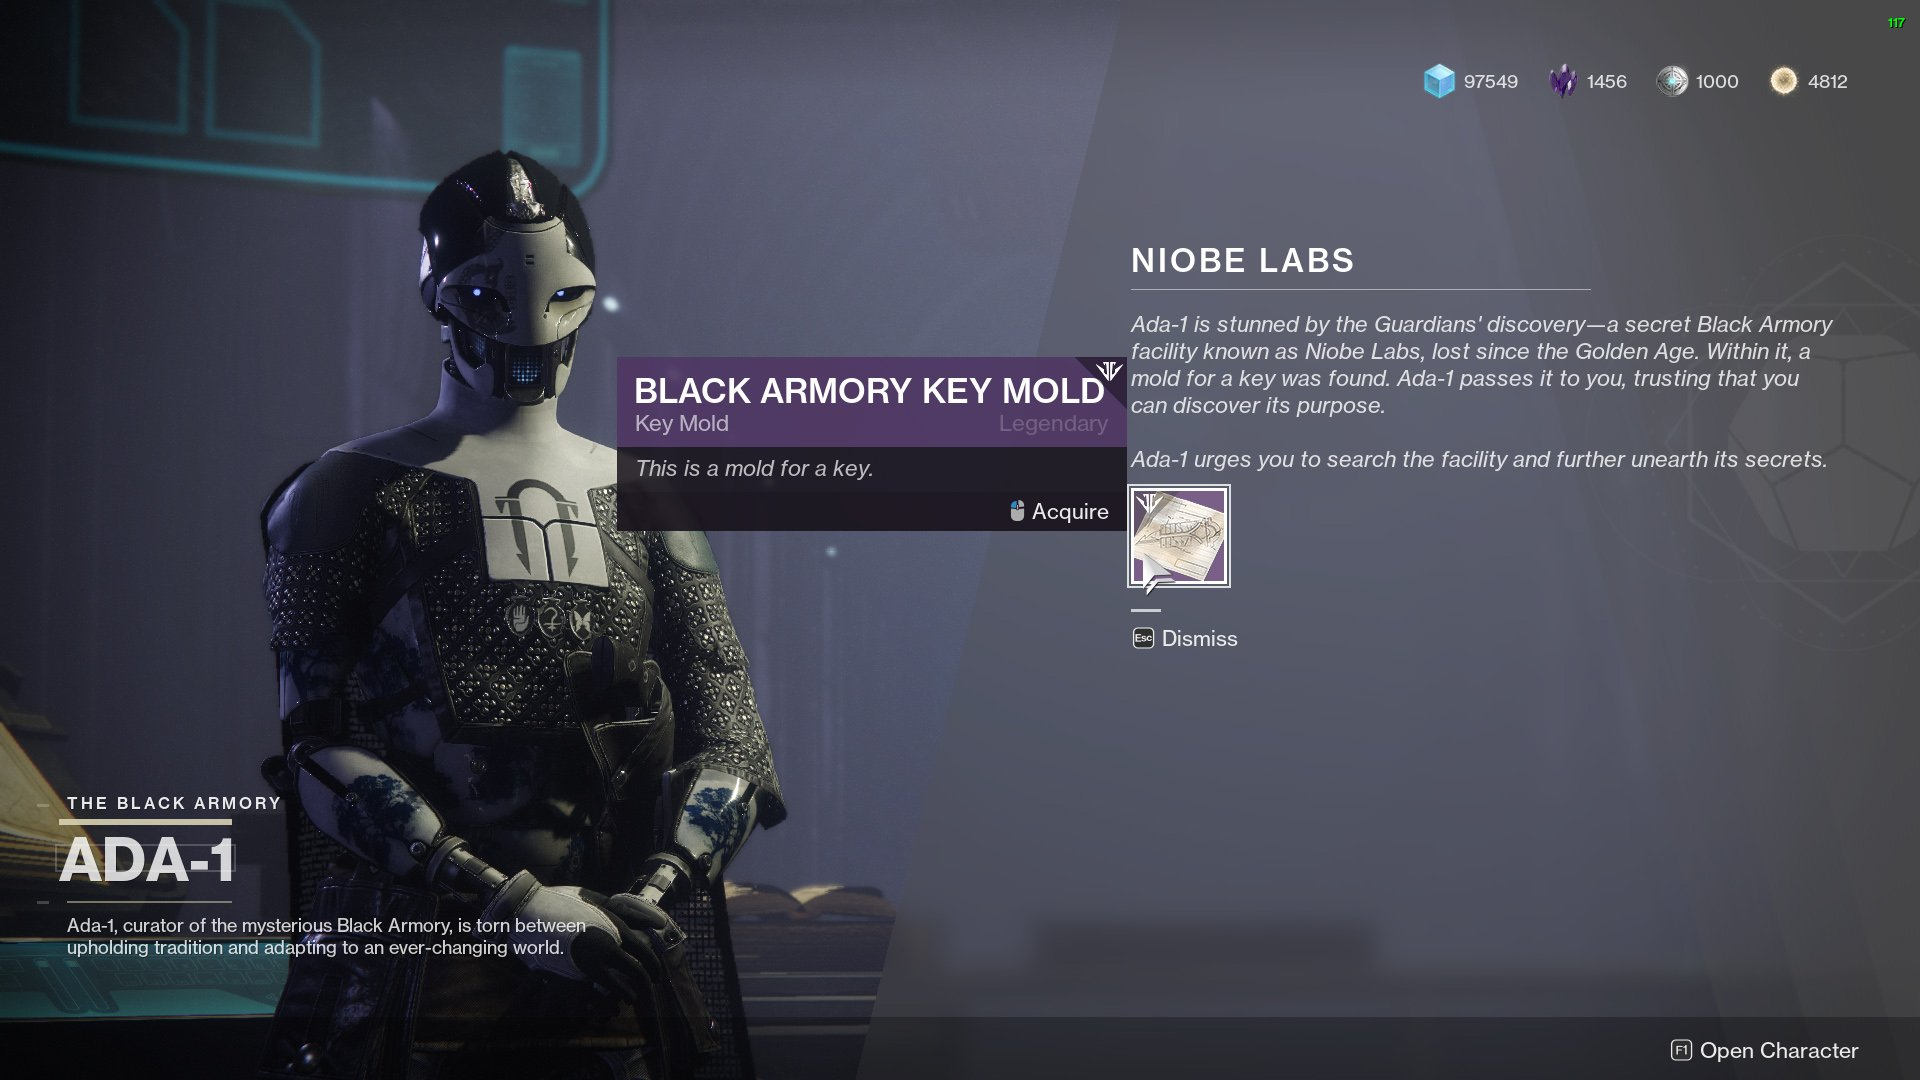 Destiny 2 Black Armory Key Mold